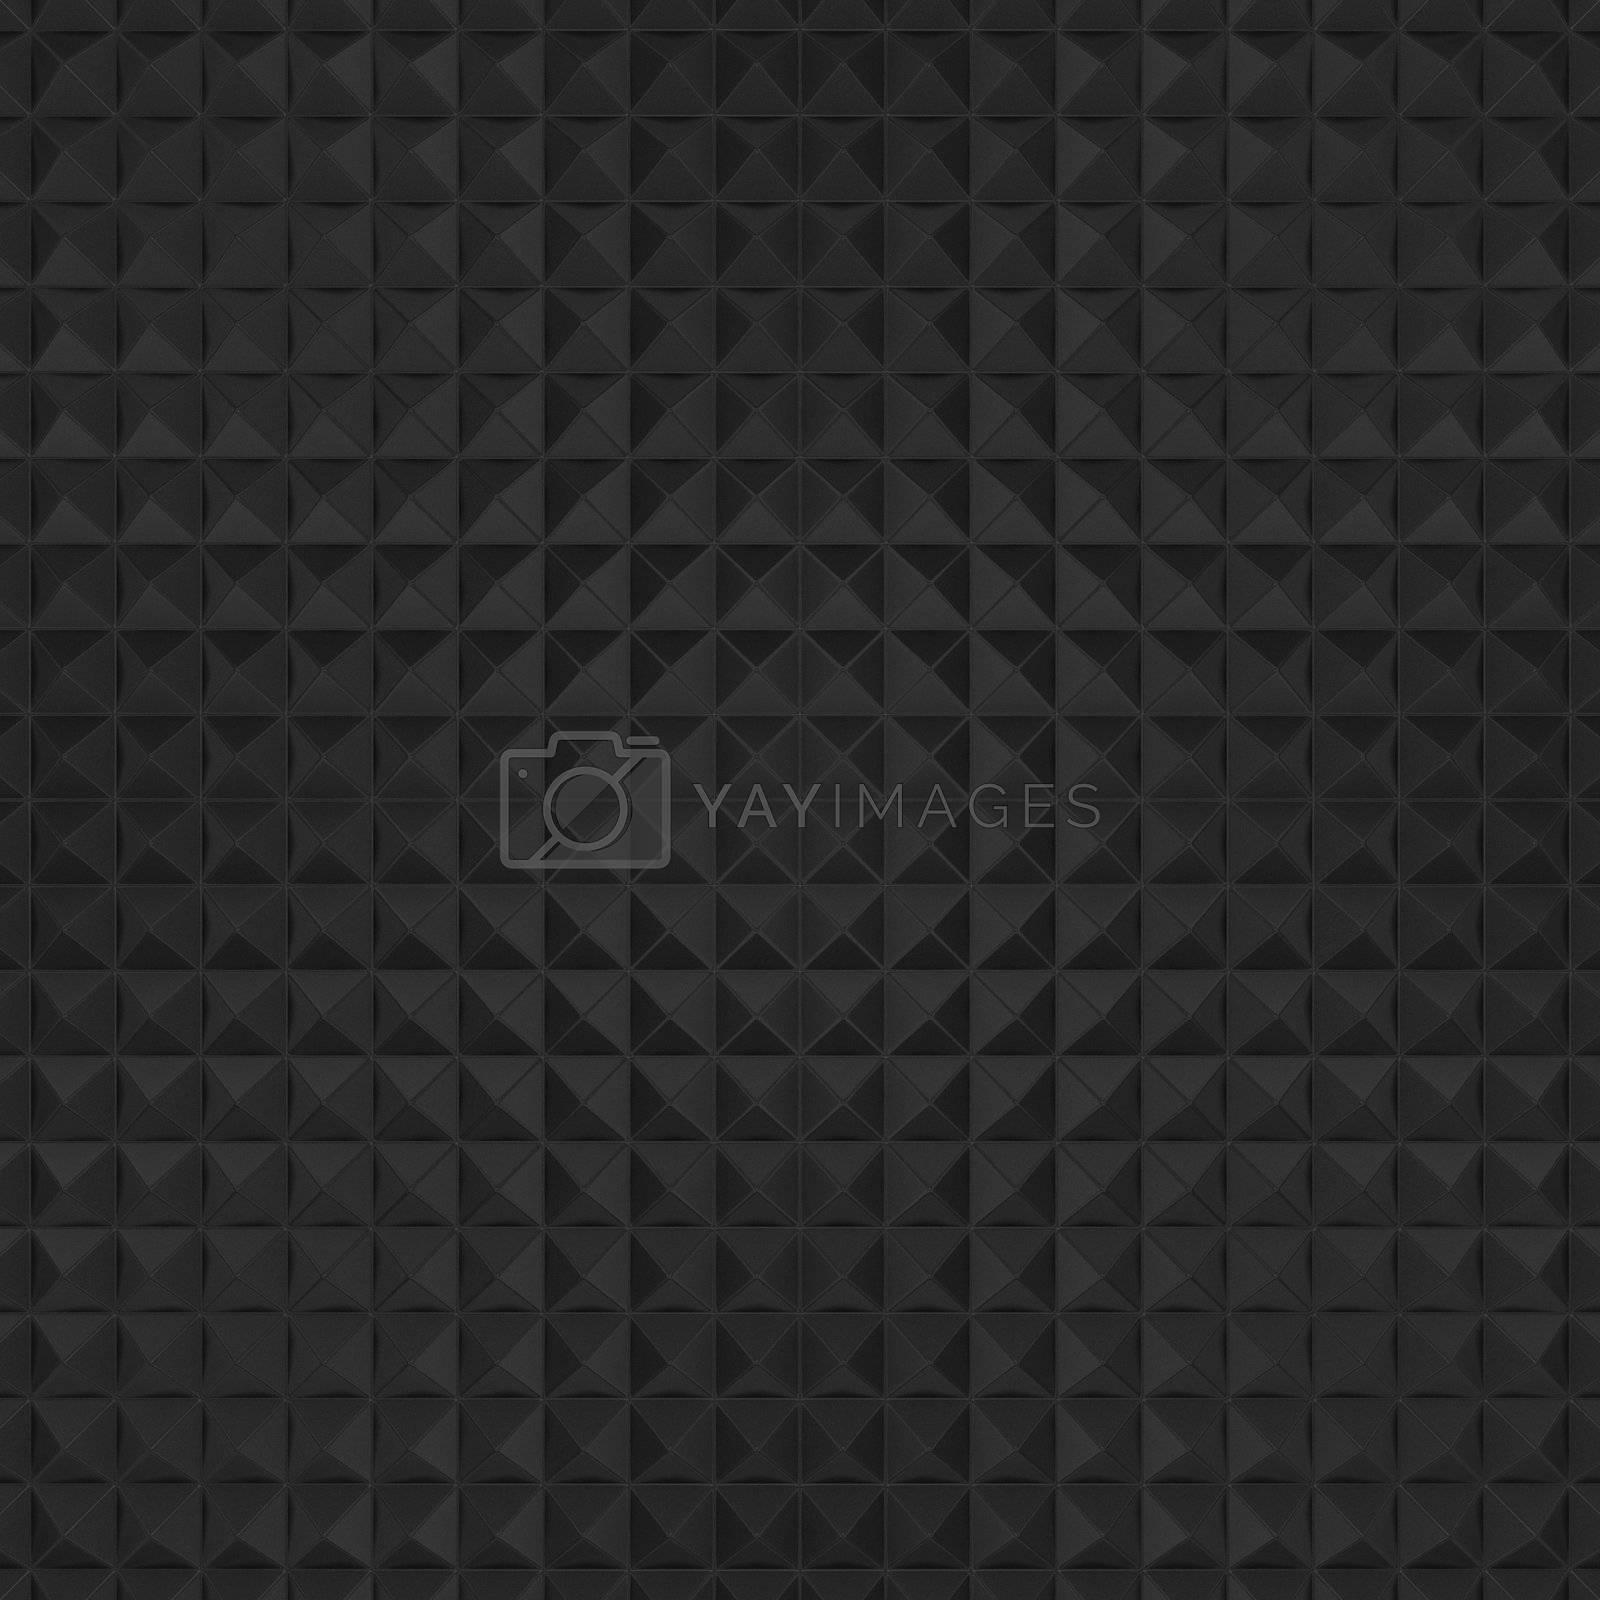 Black tiles background, sculptured texture